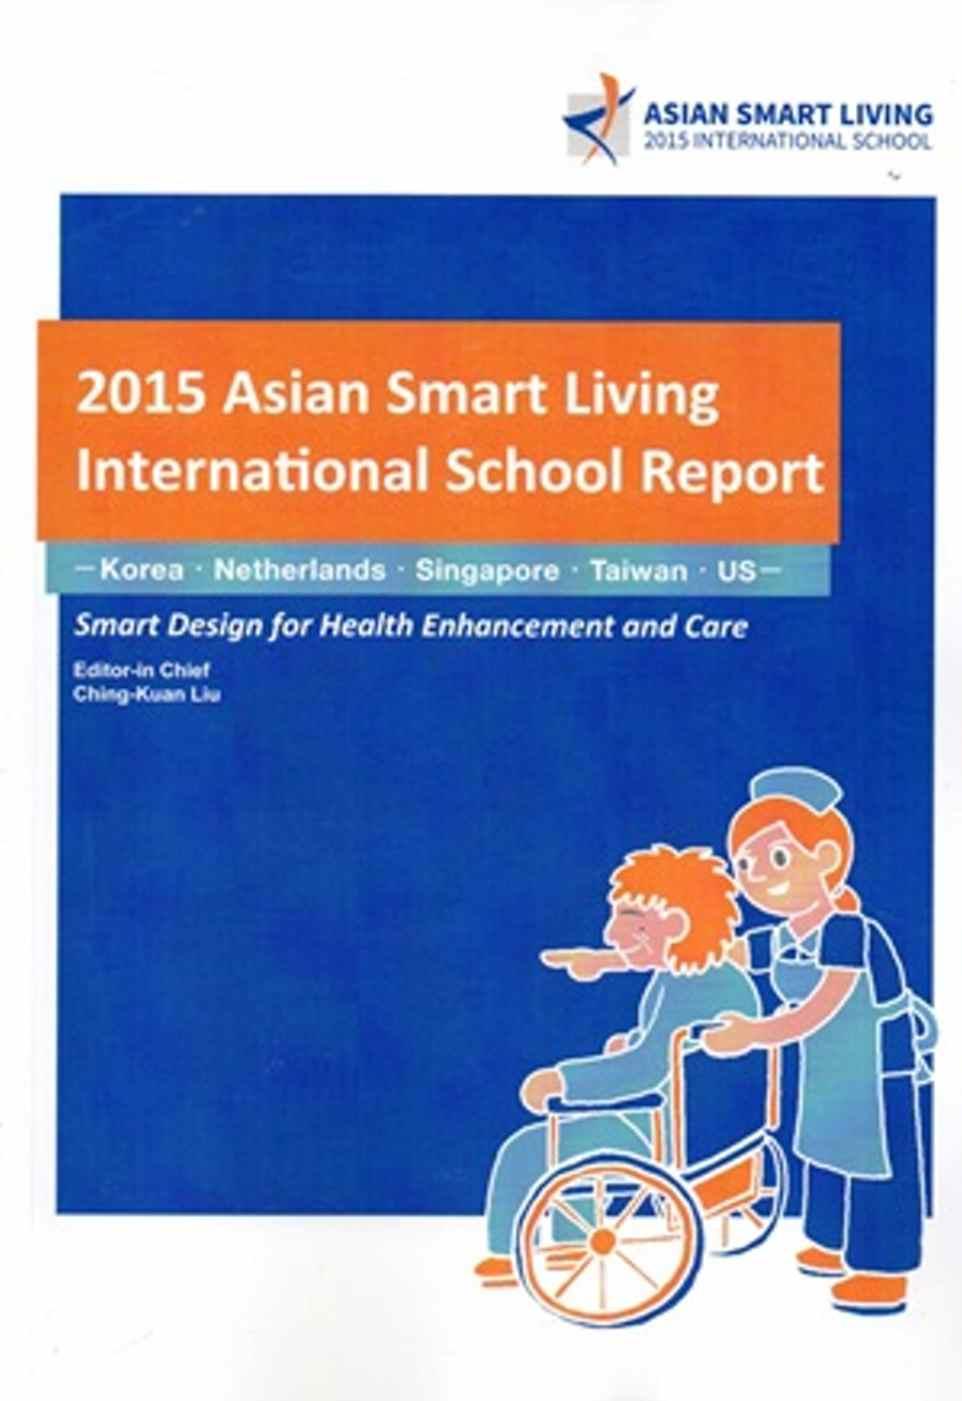 2015 Asian Smart Living International School